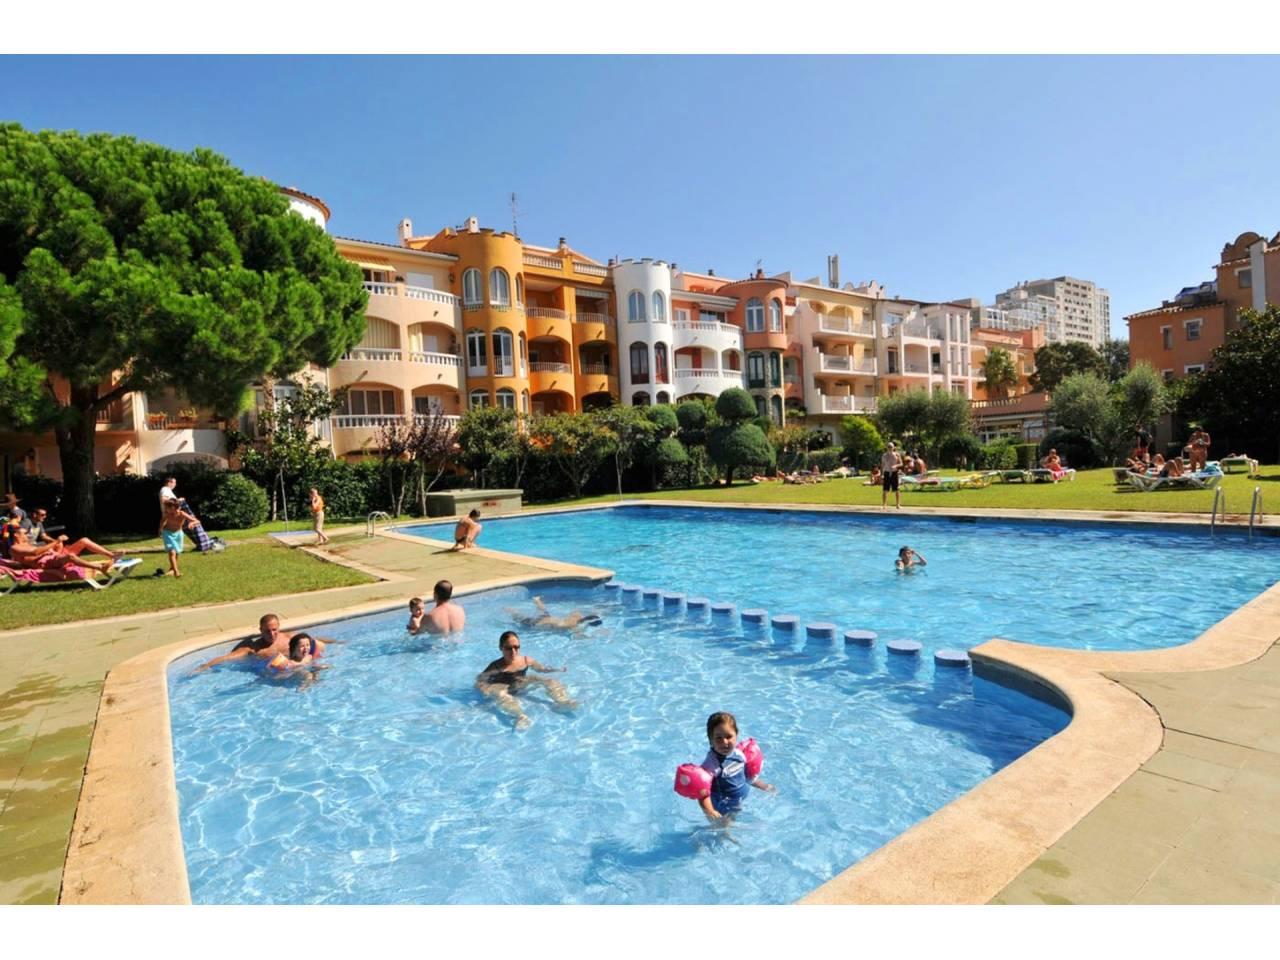 000007 - GRAN RESERVA Appartement avec piscine communautaire et jardins